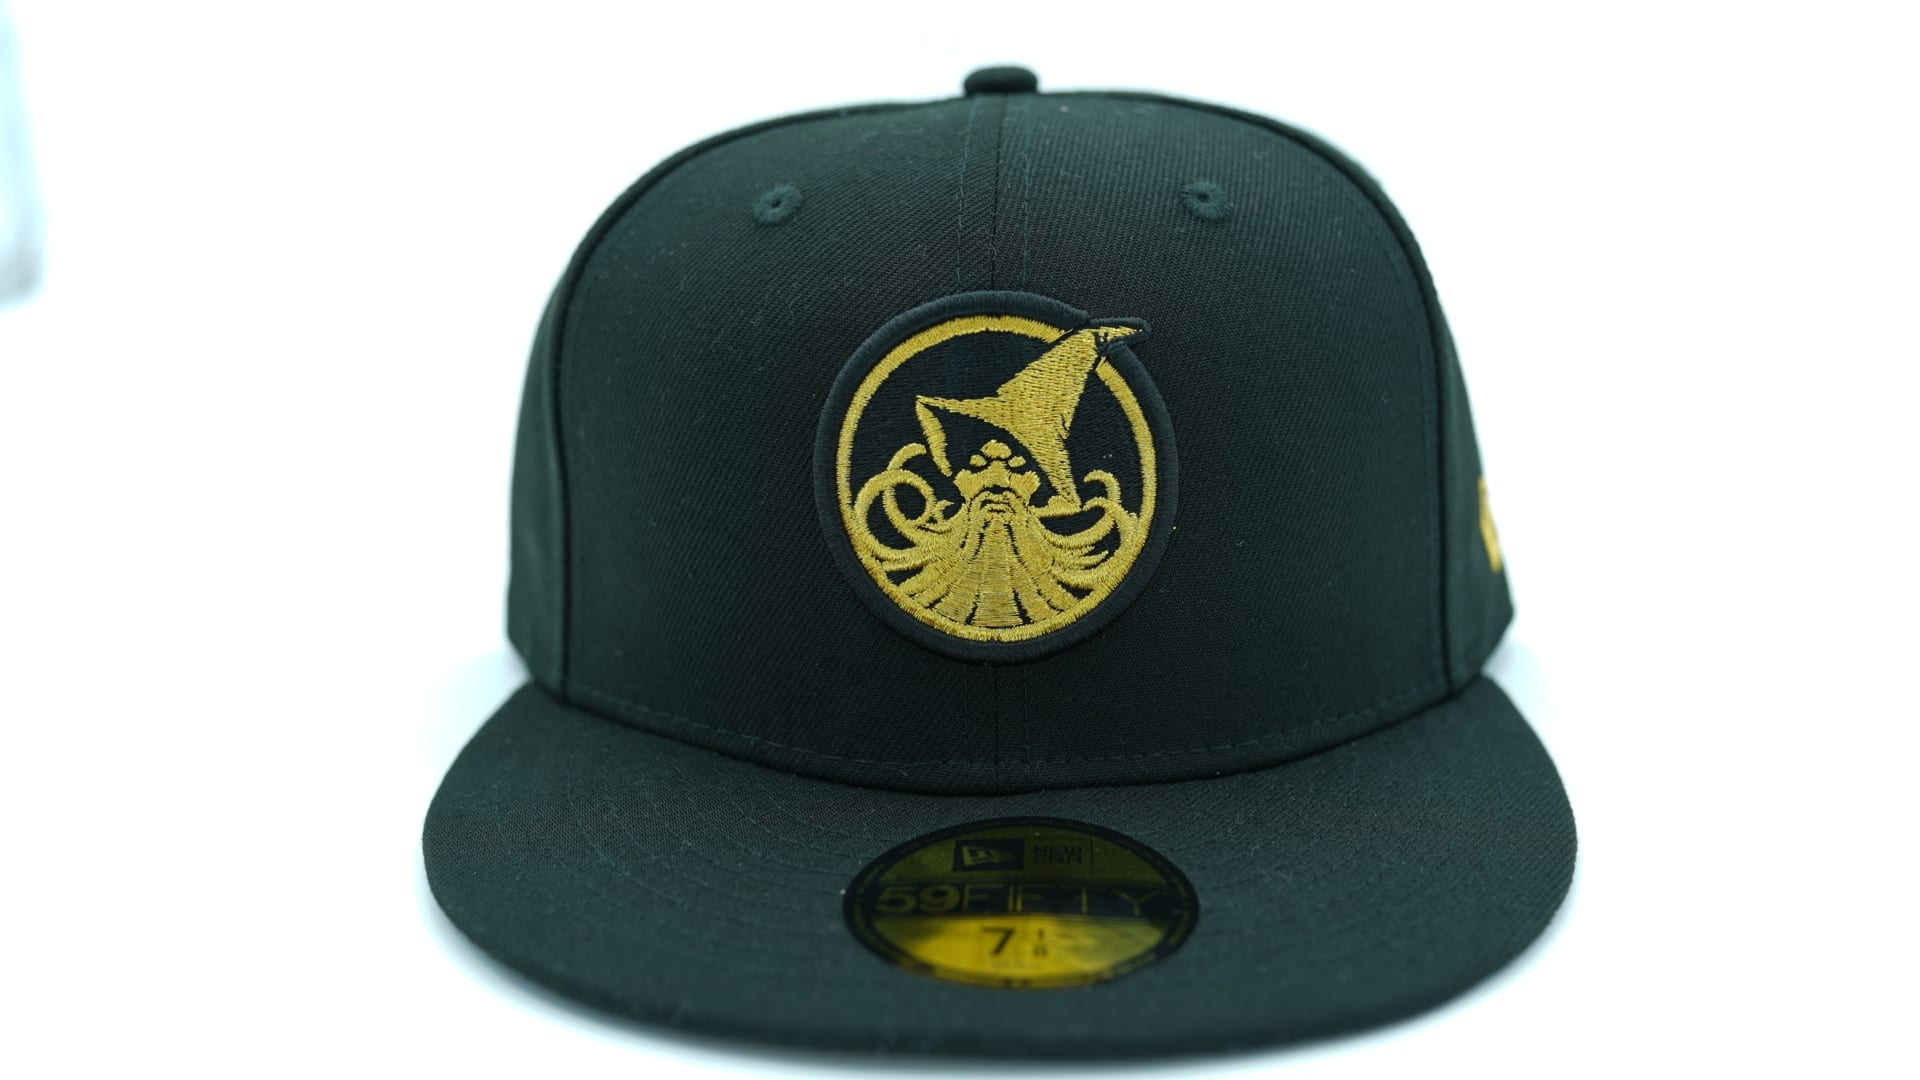 8458307f8b2 Houston Astros 2017 World Series Champions Locker Room Graphite 39Thirty Flex  Hat by NEW ERA x